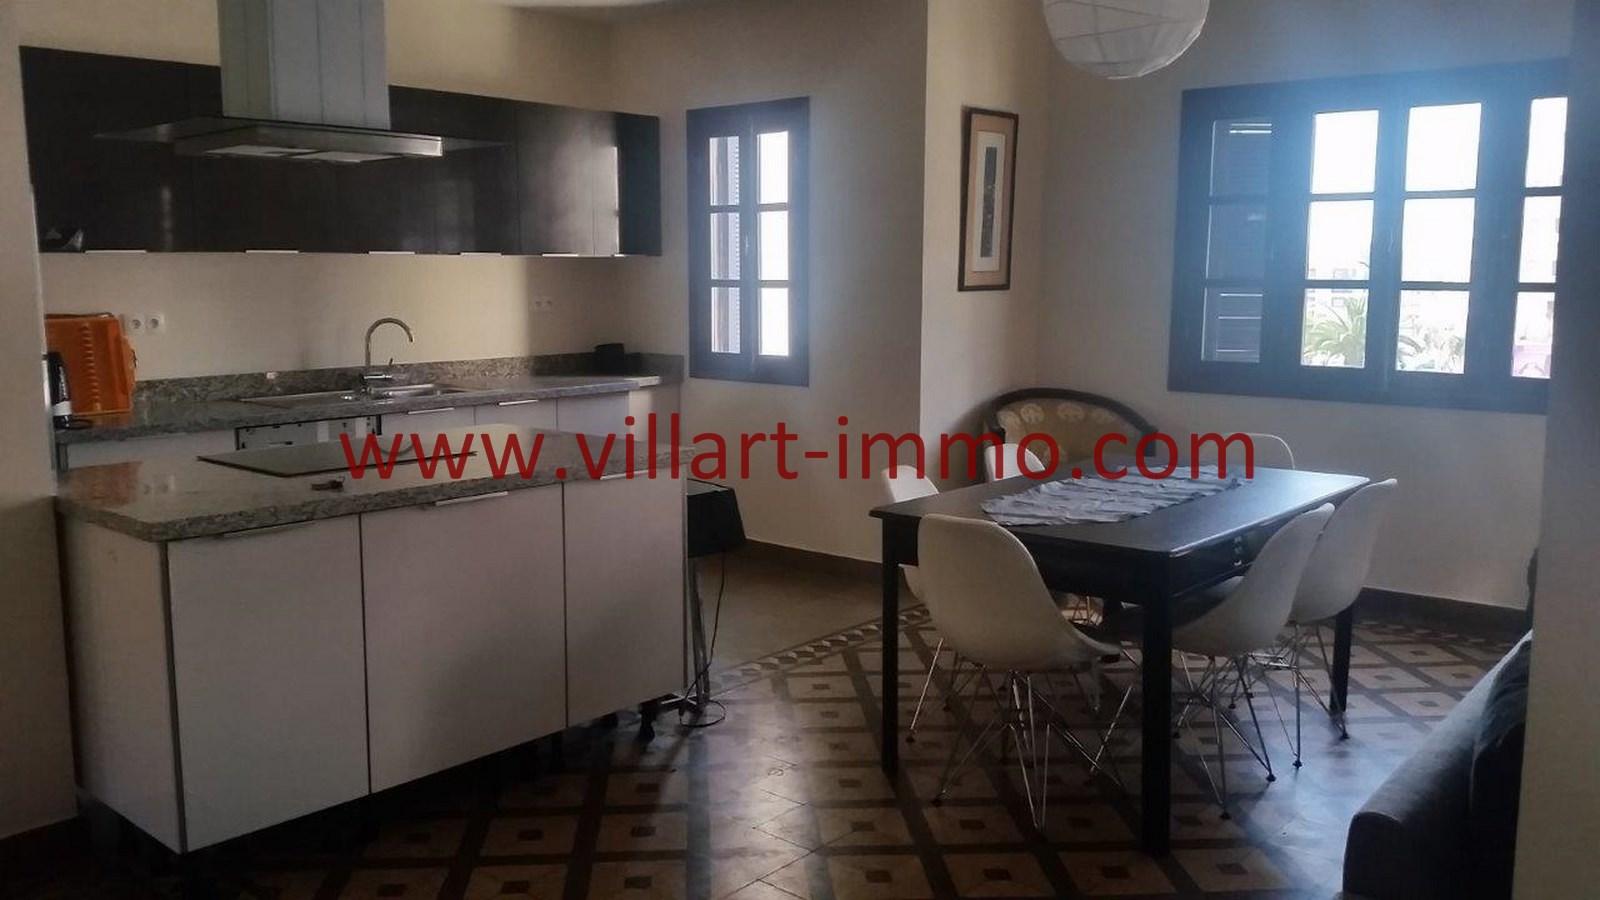 5-a-louer-appartement-meuble-centre-ville-tanger-cuisine-1-l964-villart-immo